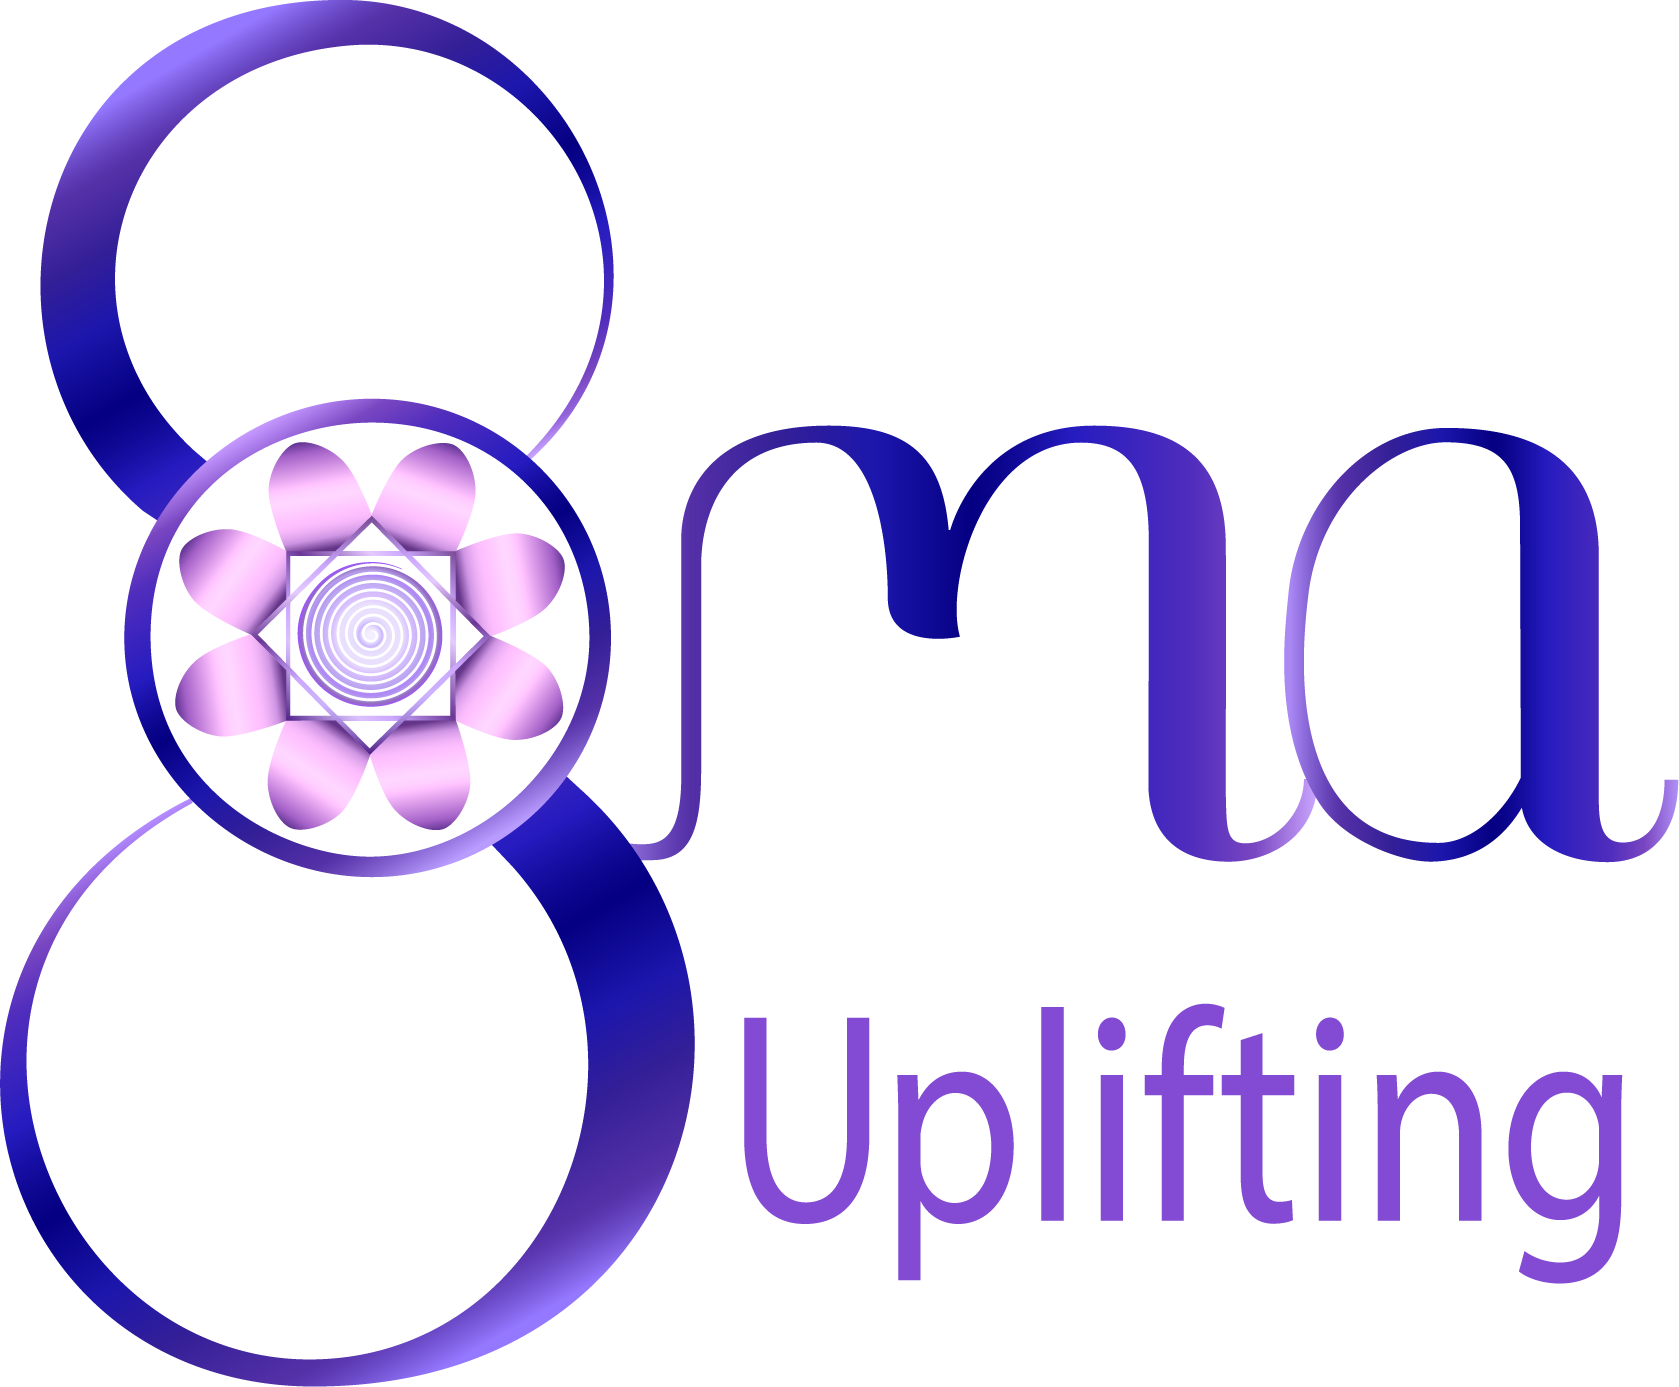 Soma Uplifting – kasvojen hieronnan synty